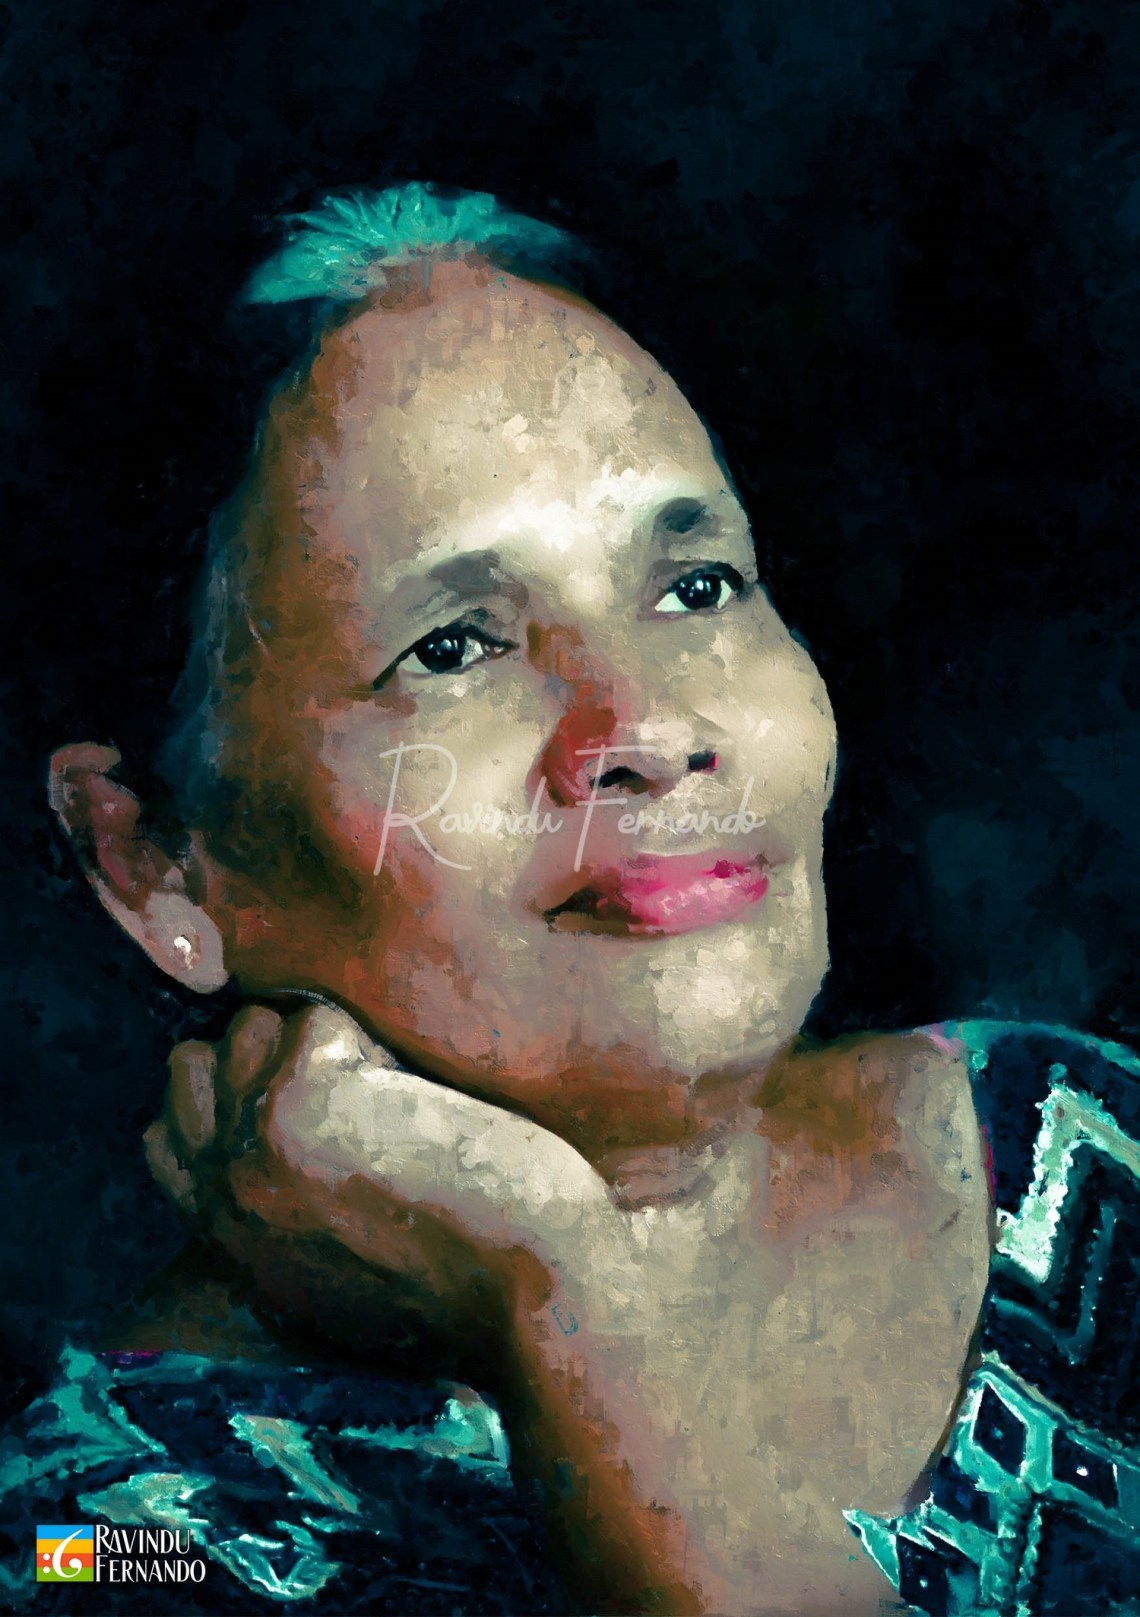 Shanaka Digital Oil Painting by Ravindu Fernando